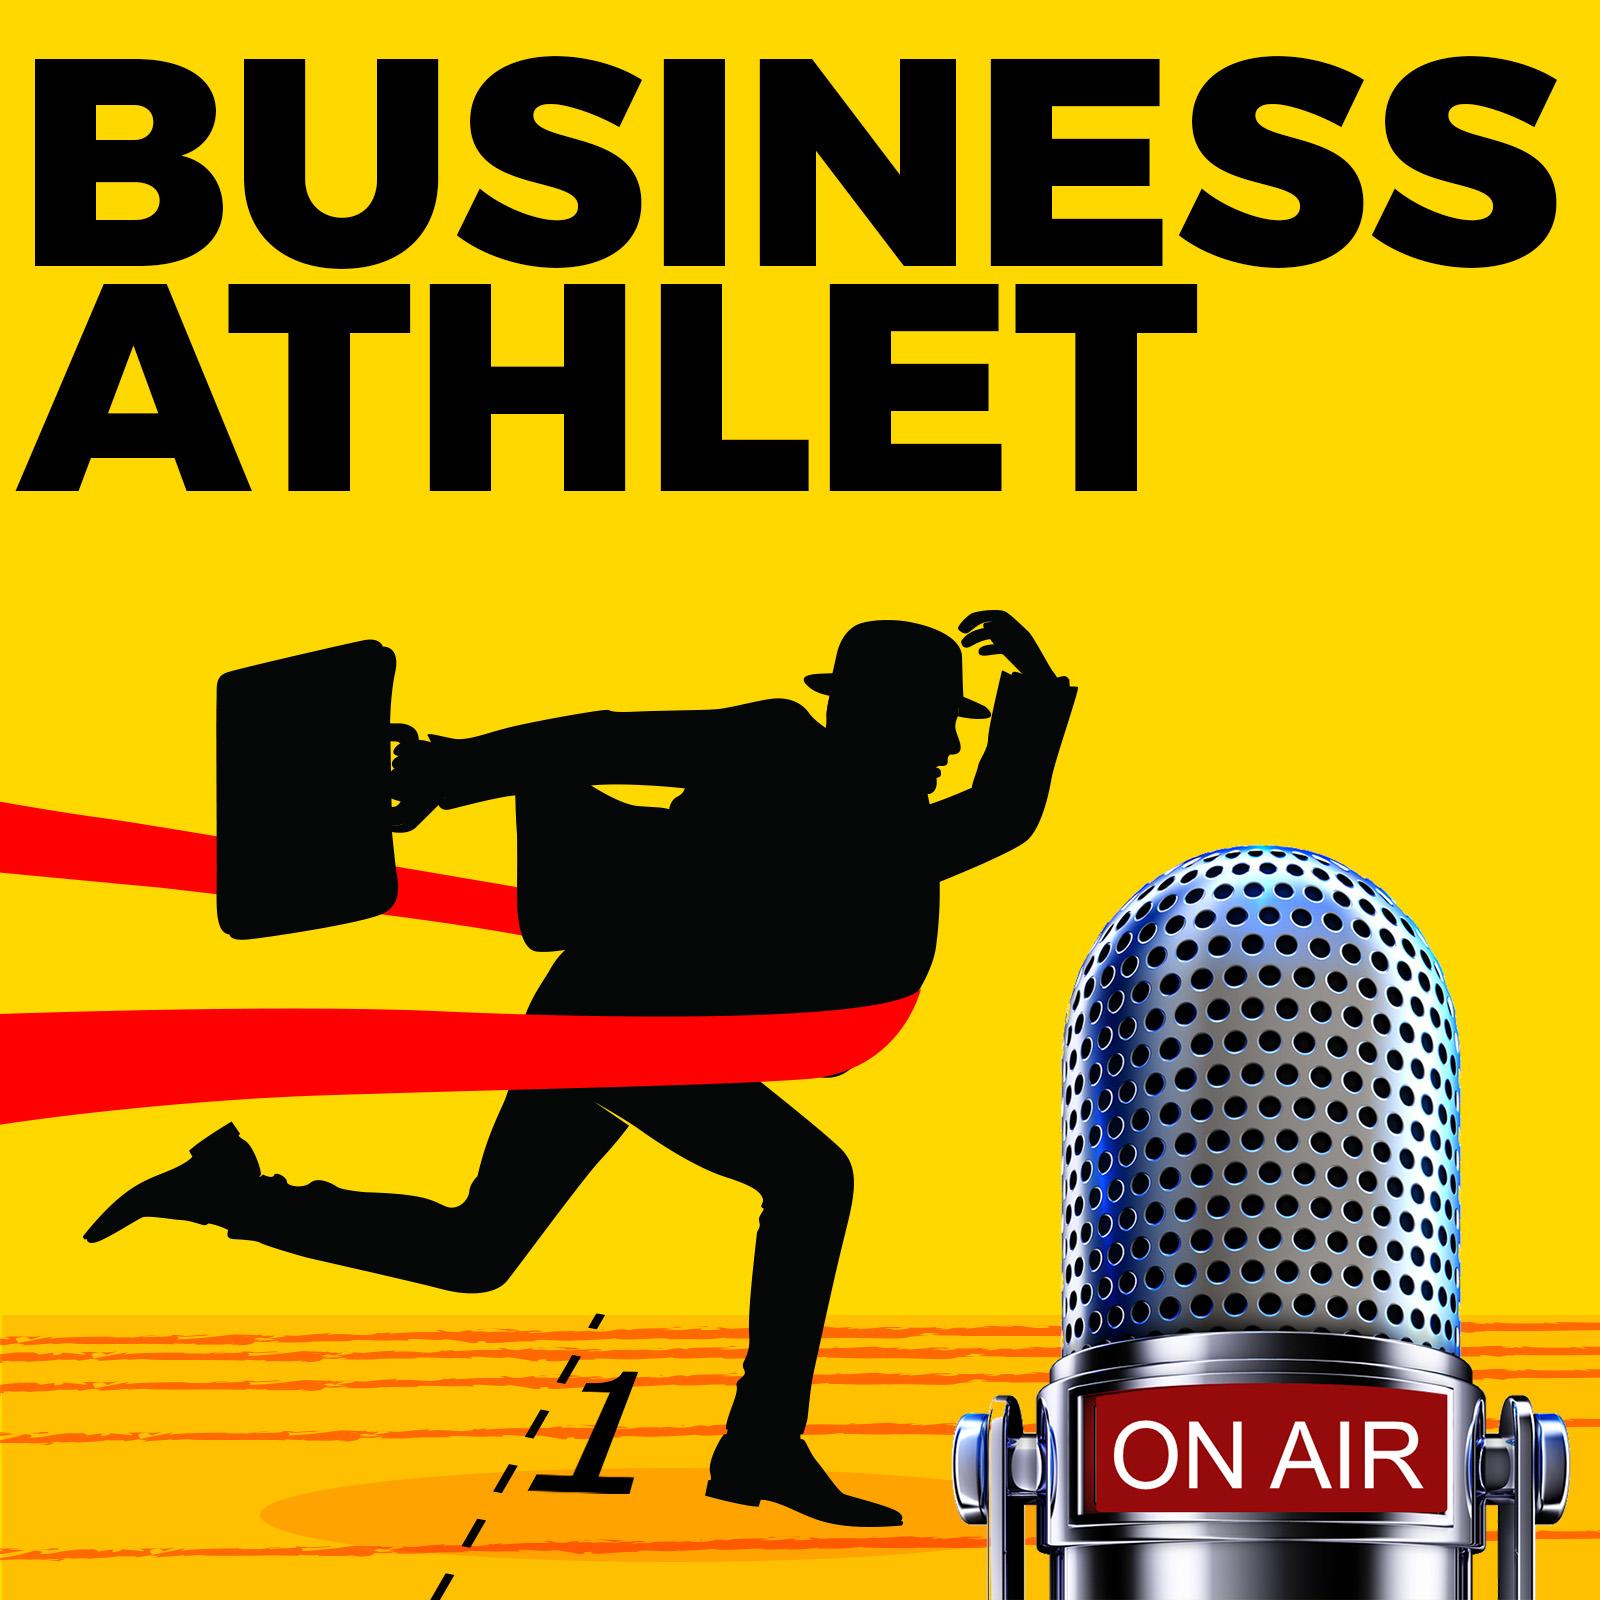 business athlet der erfolgspodcast f r unternehmer manager ihres eigenen lebens listen. Black Bedroom Furniture Sets. Home Design Ideas